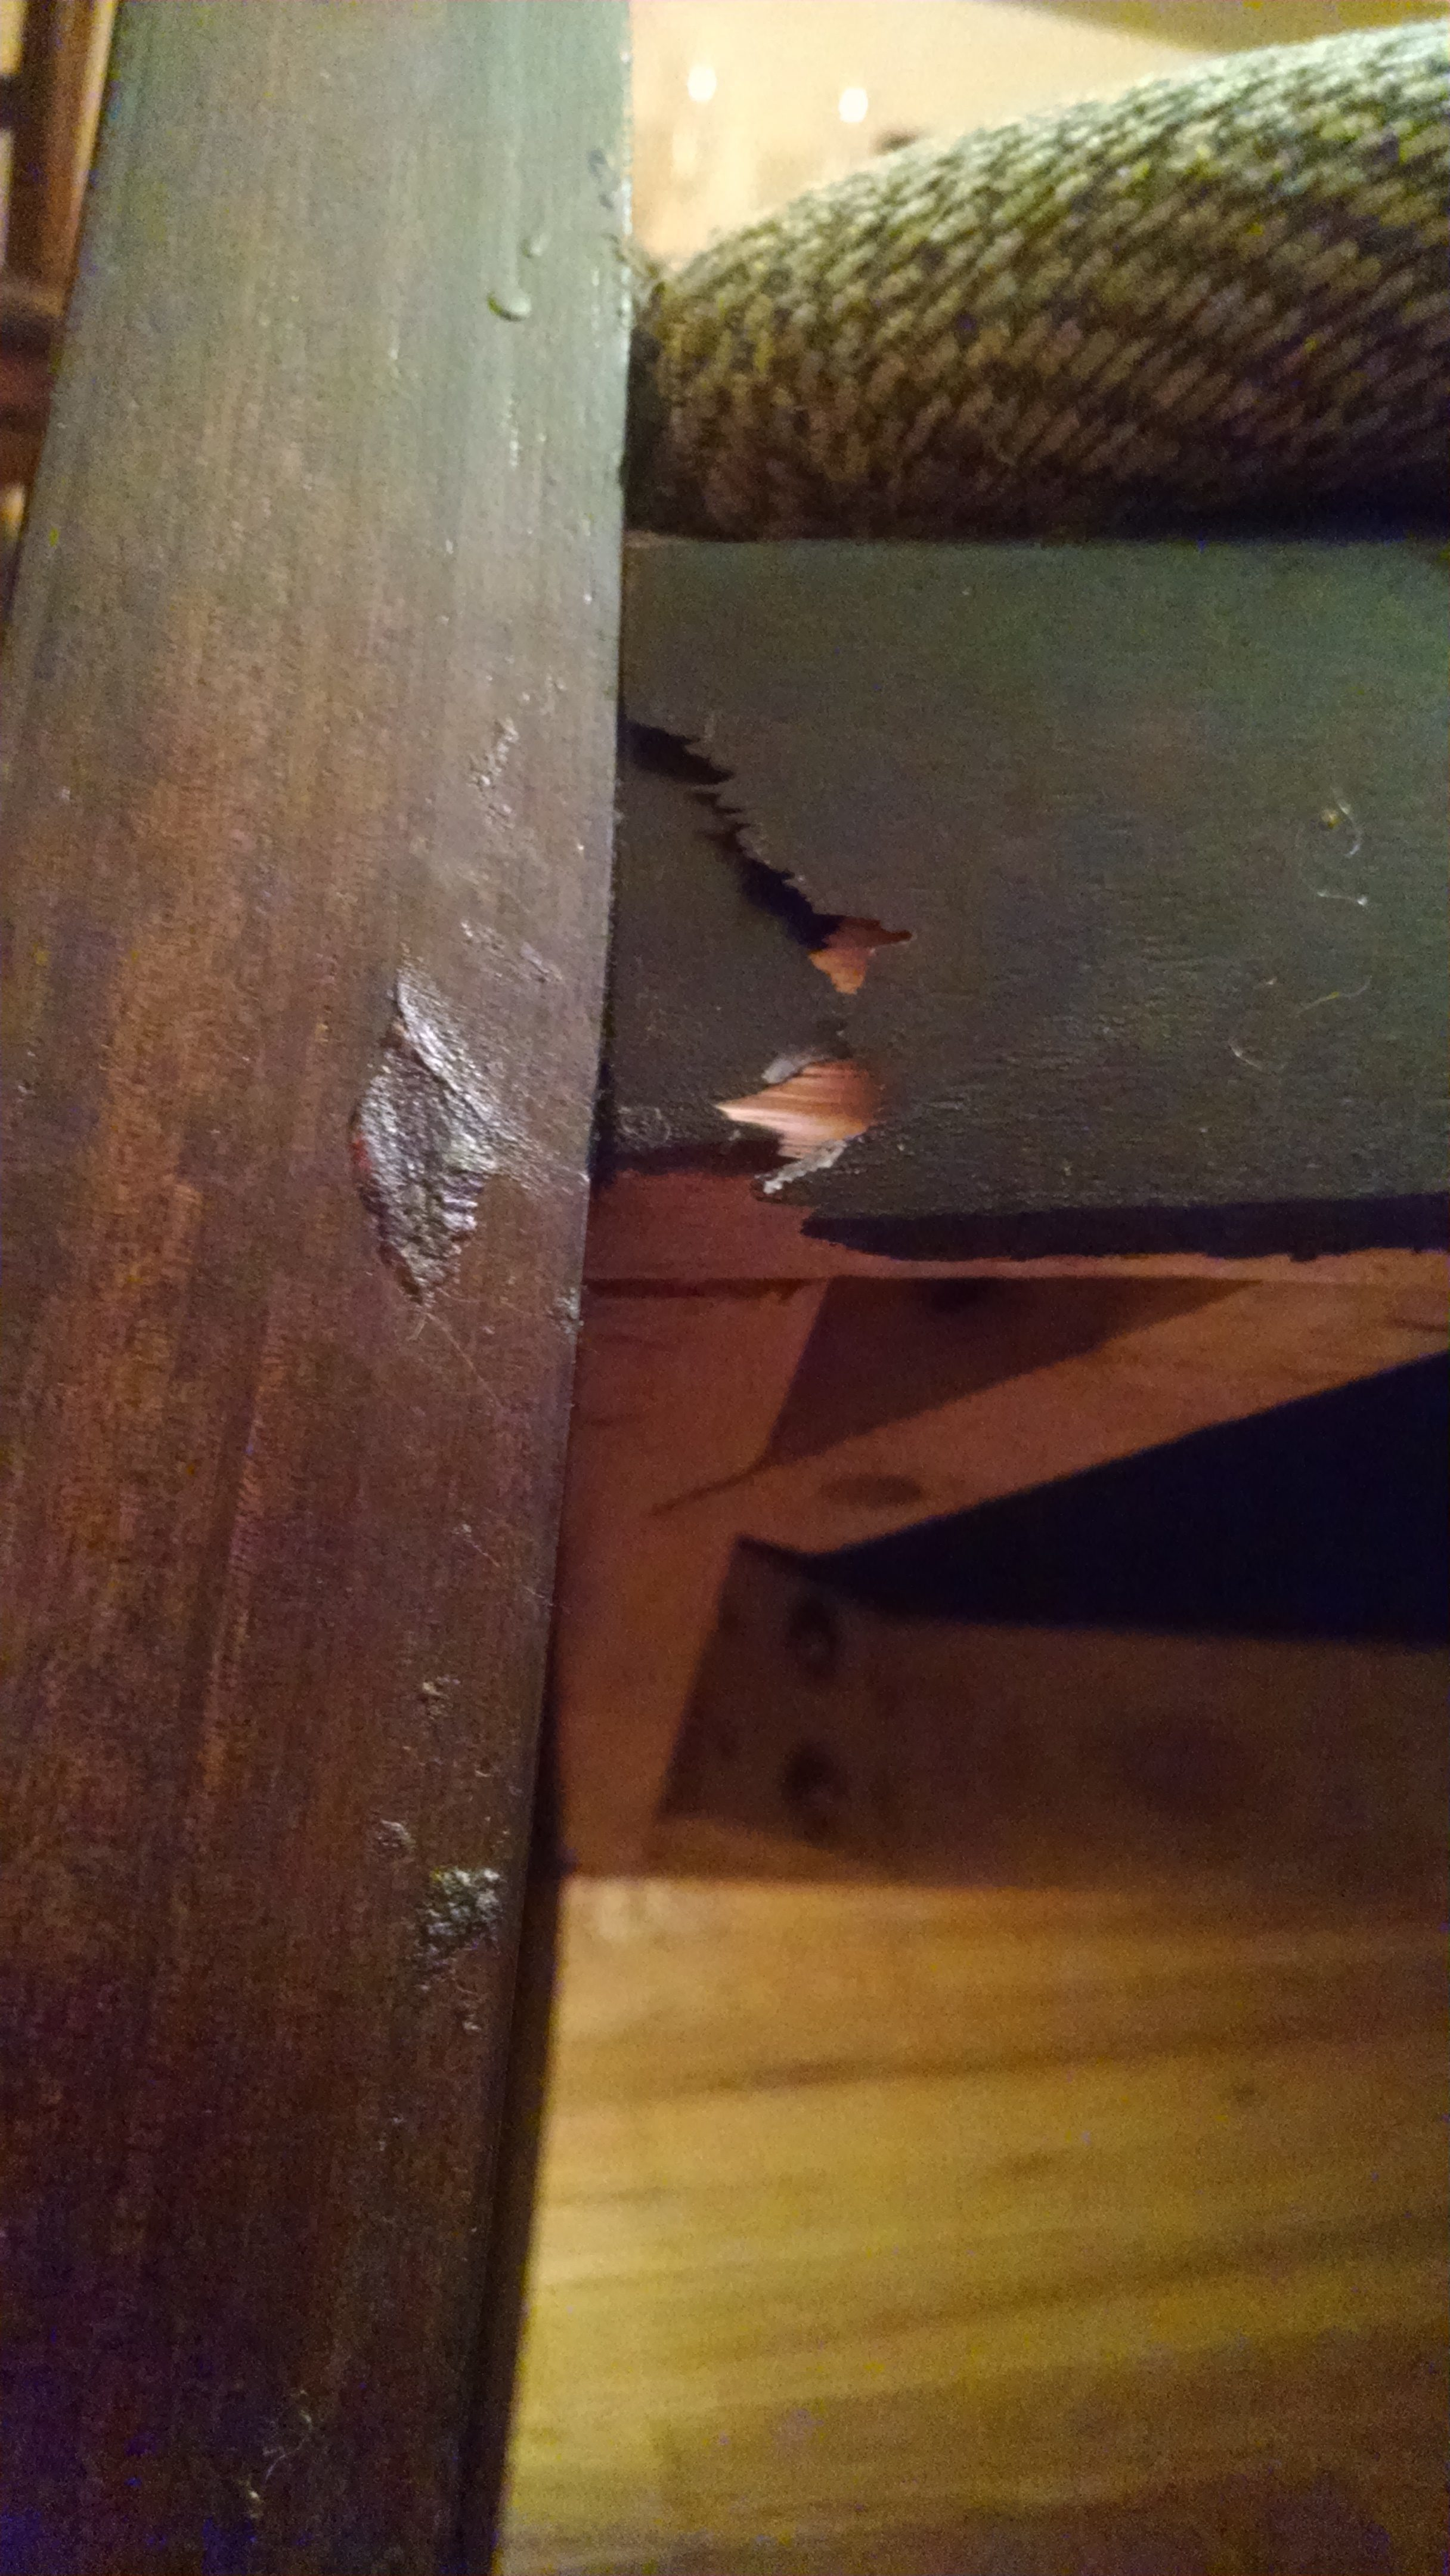 Raymour Flanigan Living Room Furniture Top 367 Complaints And Reviews About Raymour Flanigan Furniture